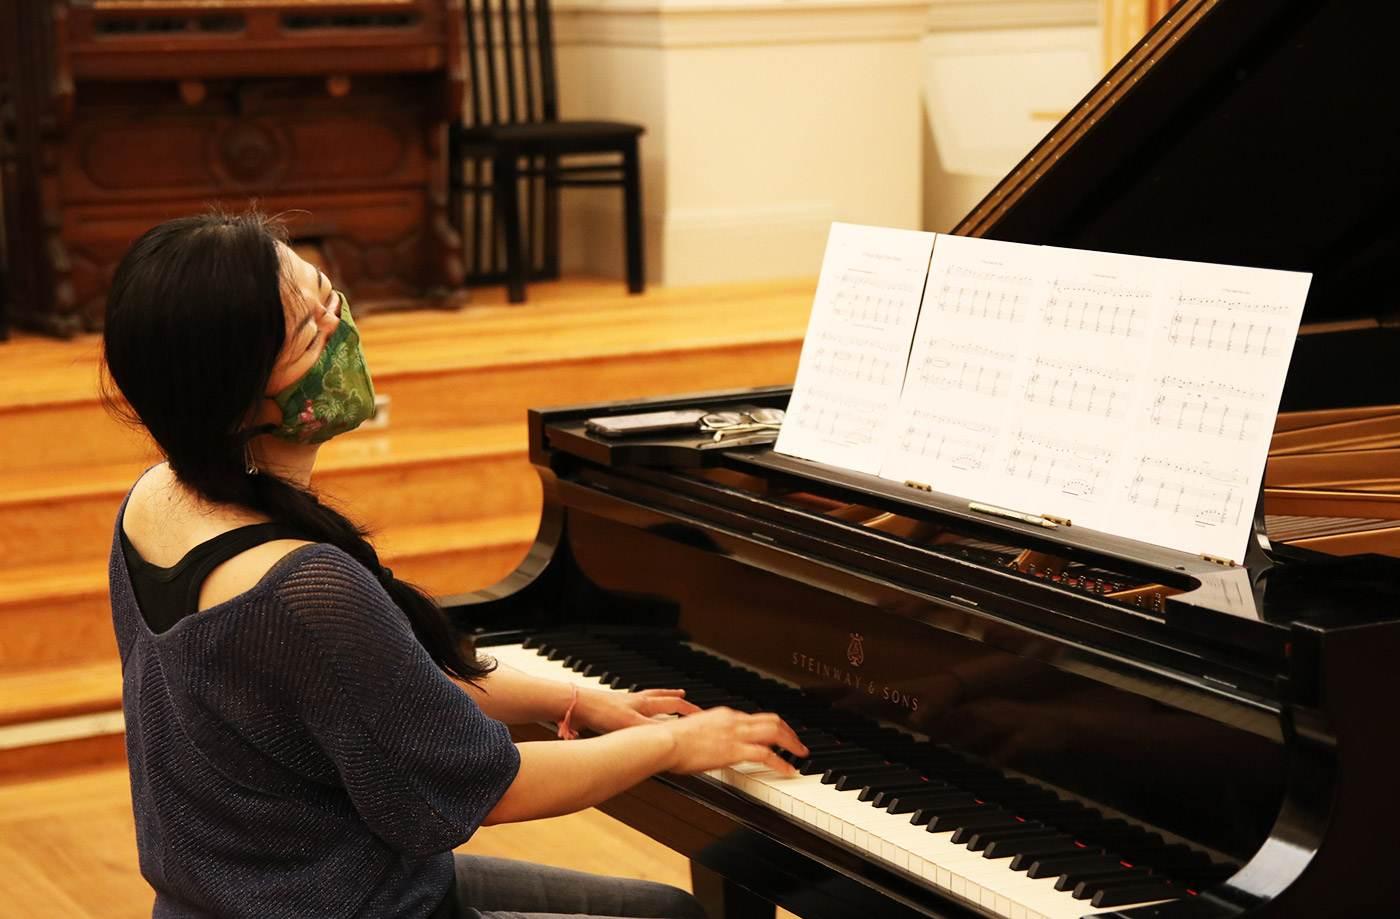 Yoko Hagino